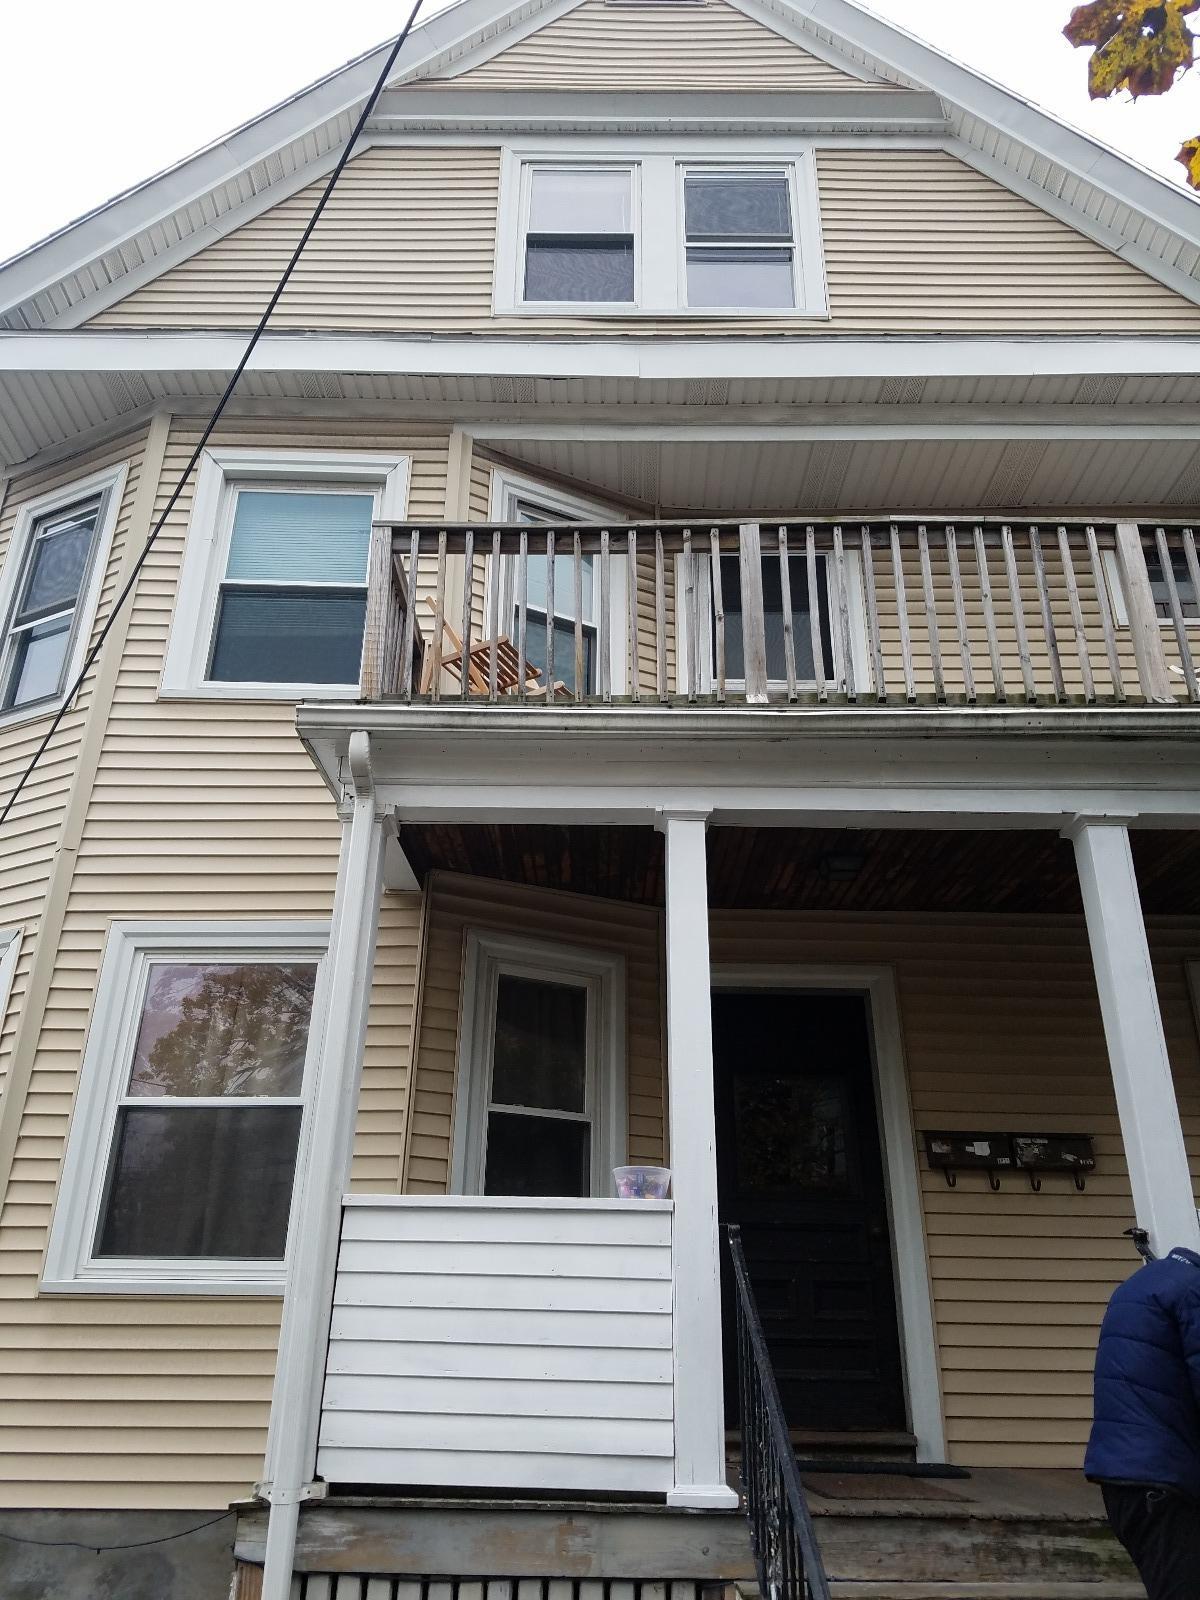 Porter St 2 Somerville Ma 02143 6 Bedroom Apartment For Rent For 4 800 Month Zumper